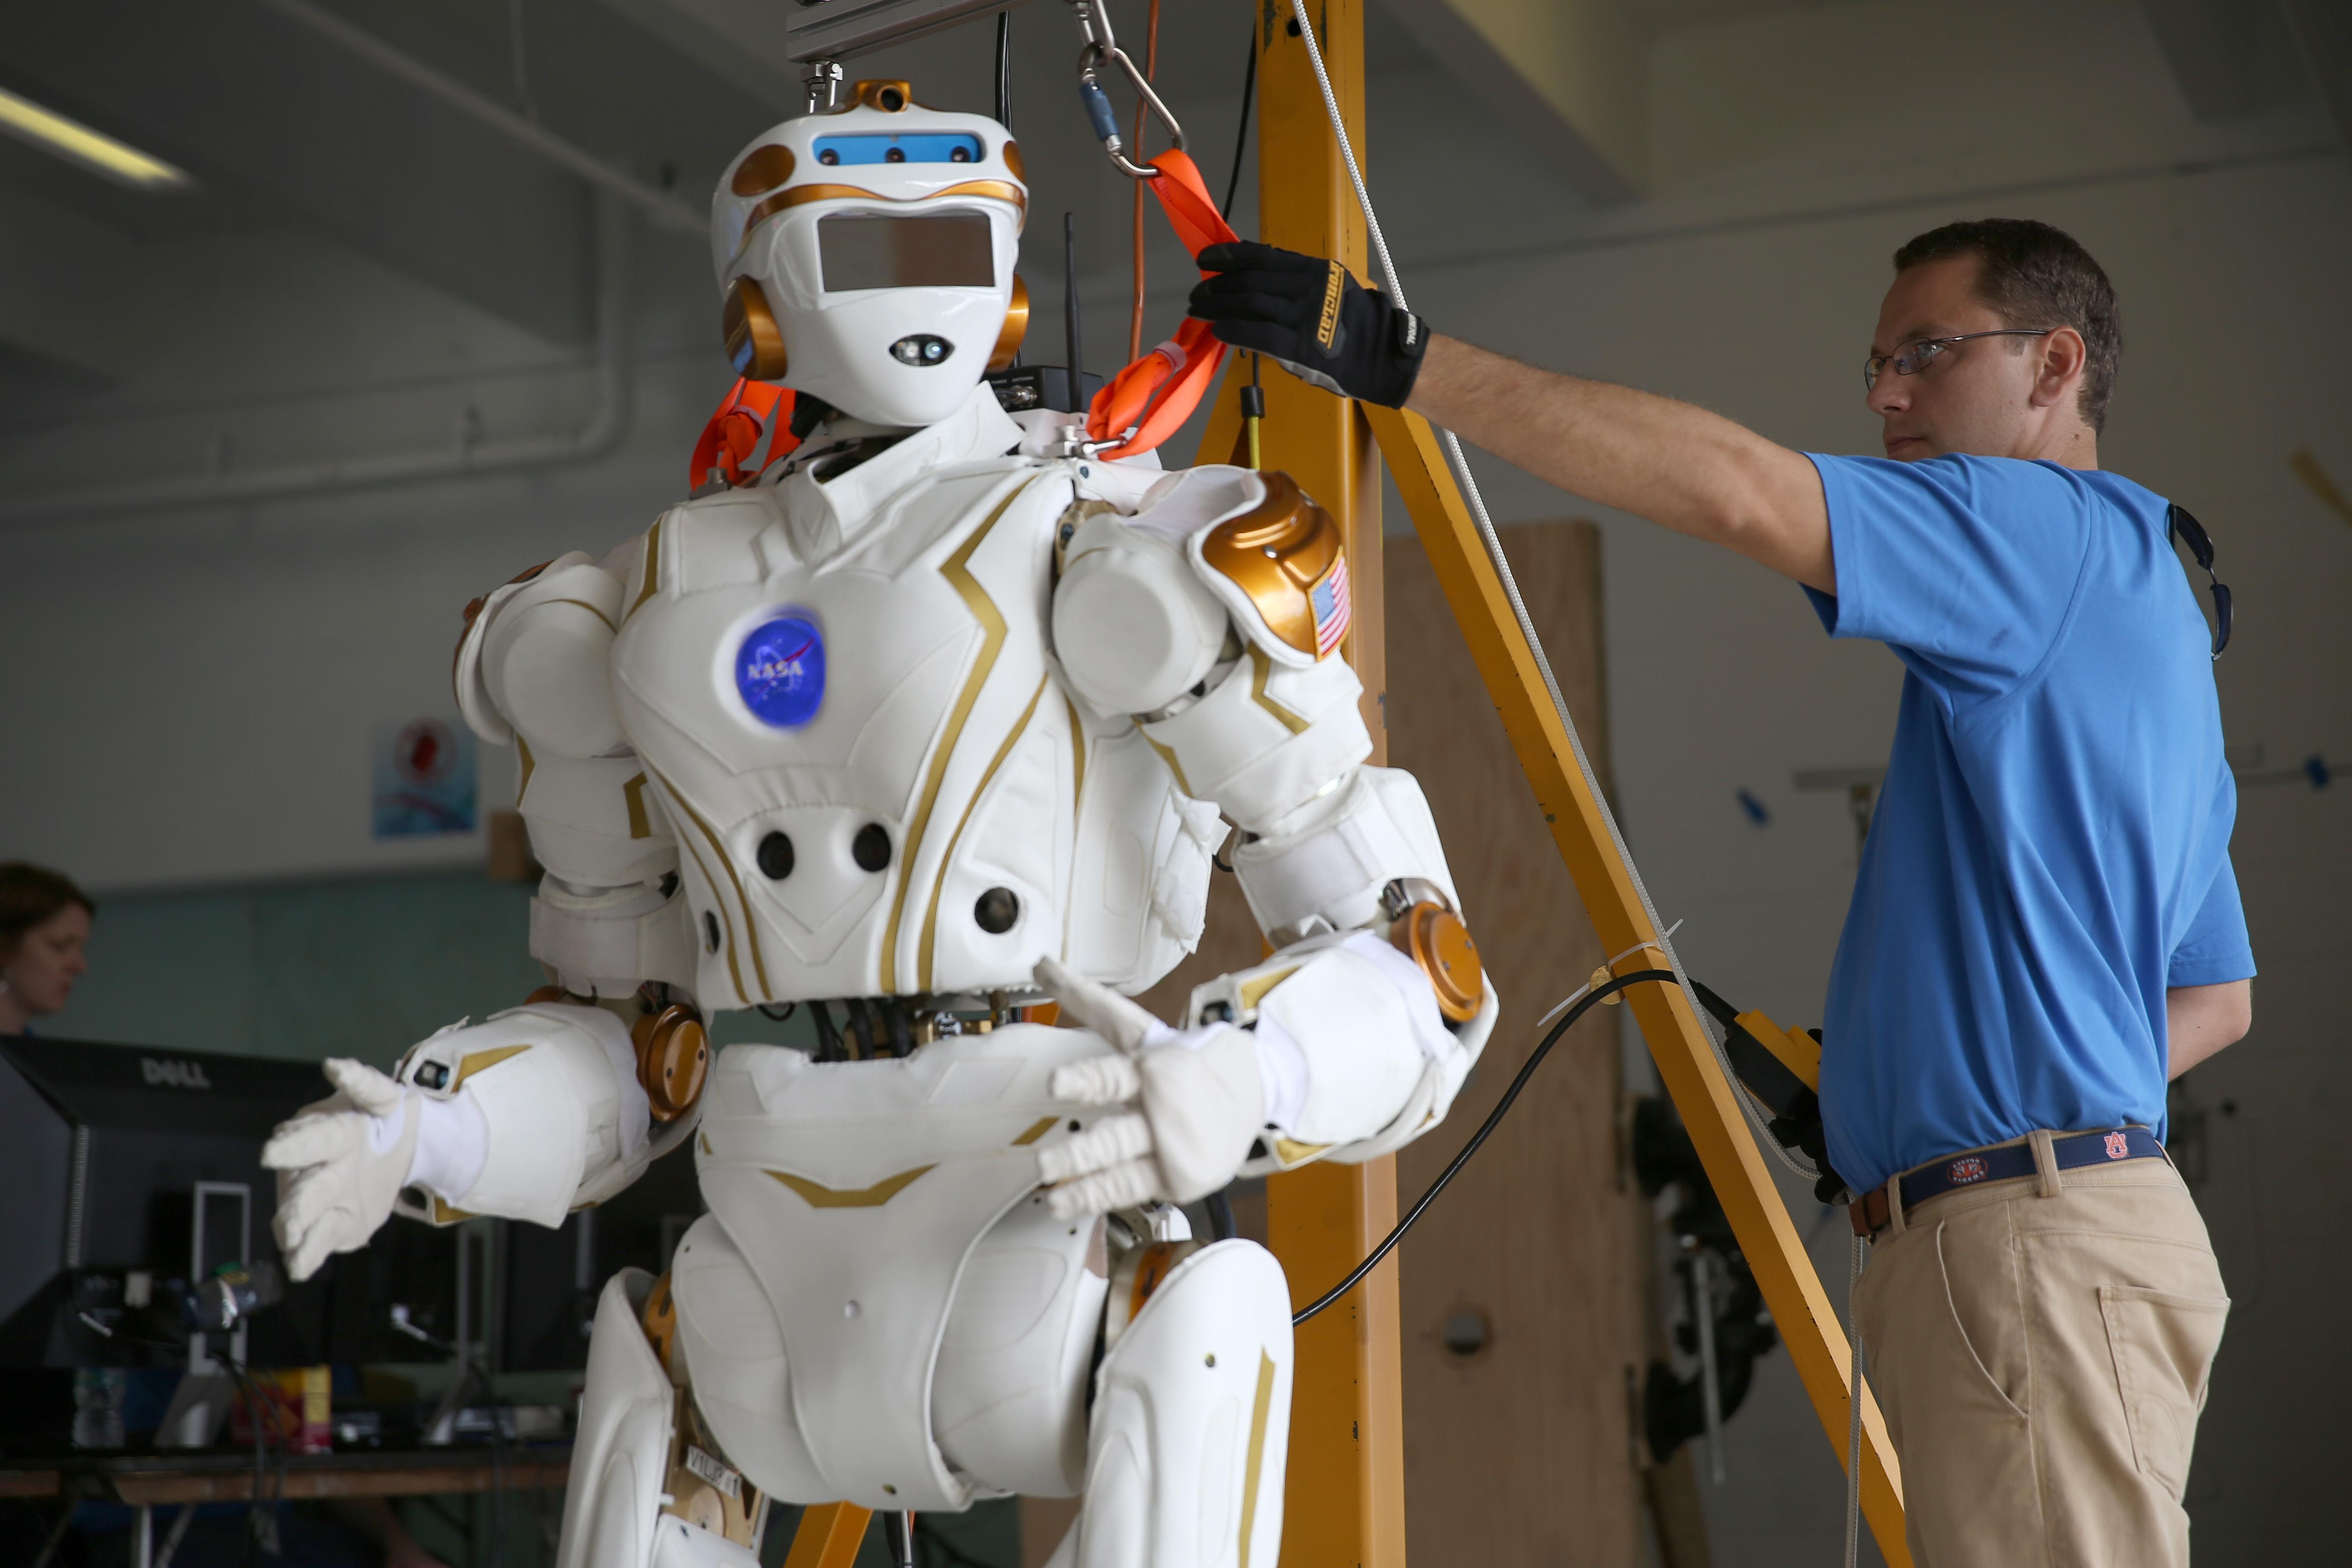 nasa humanoid robot - HD1600×915